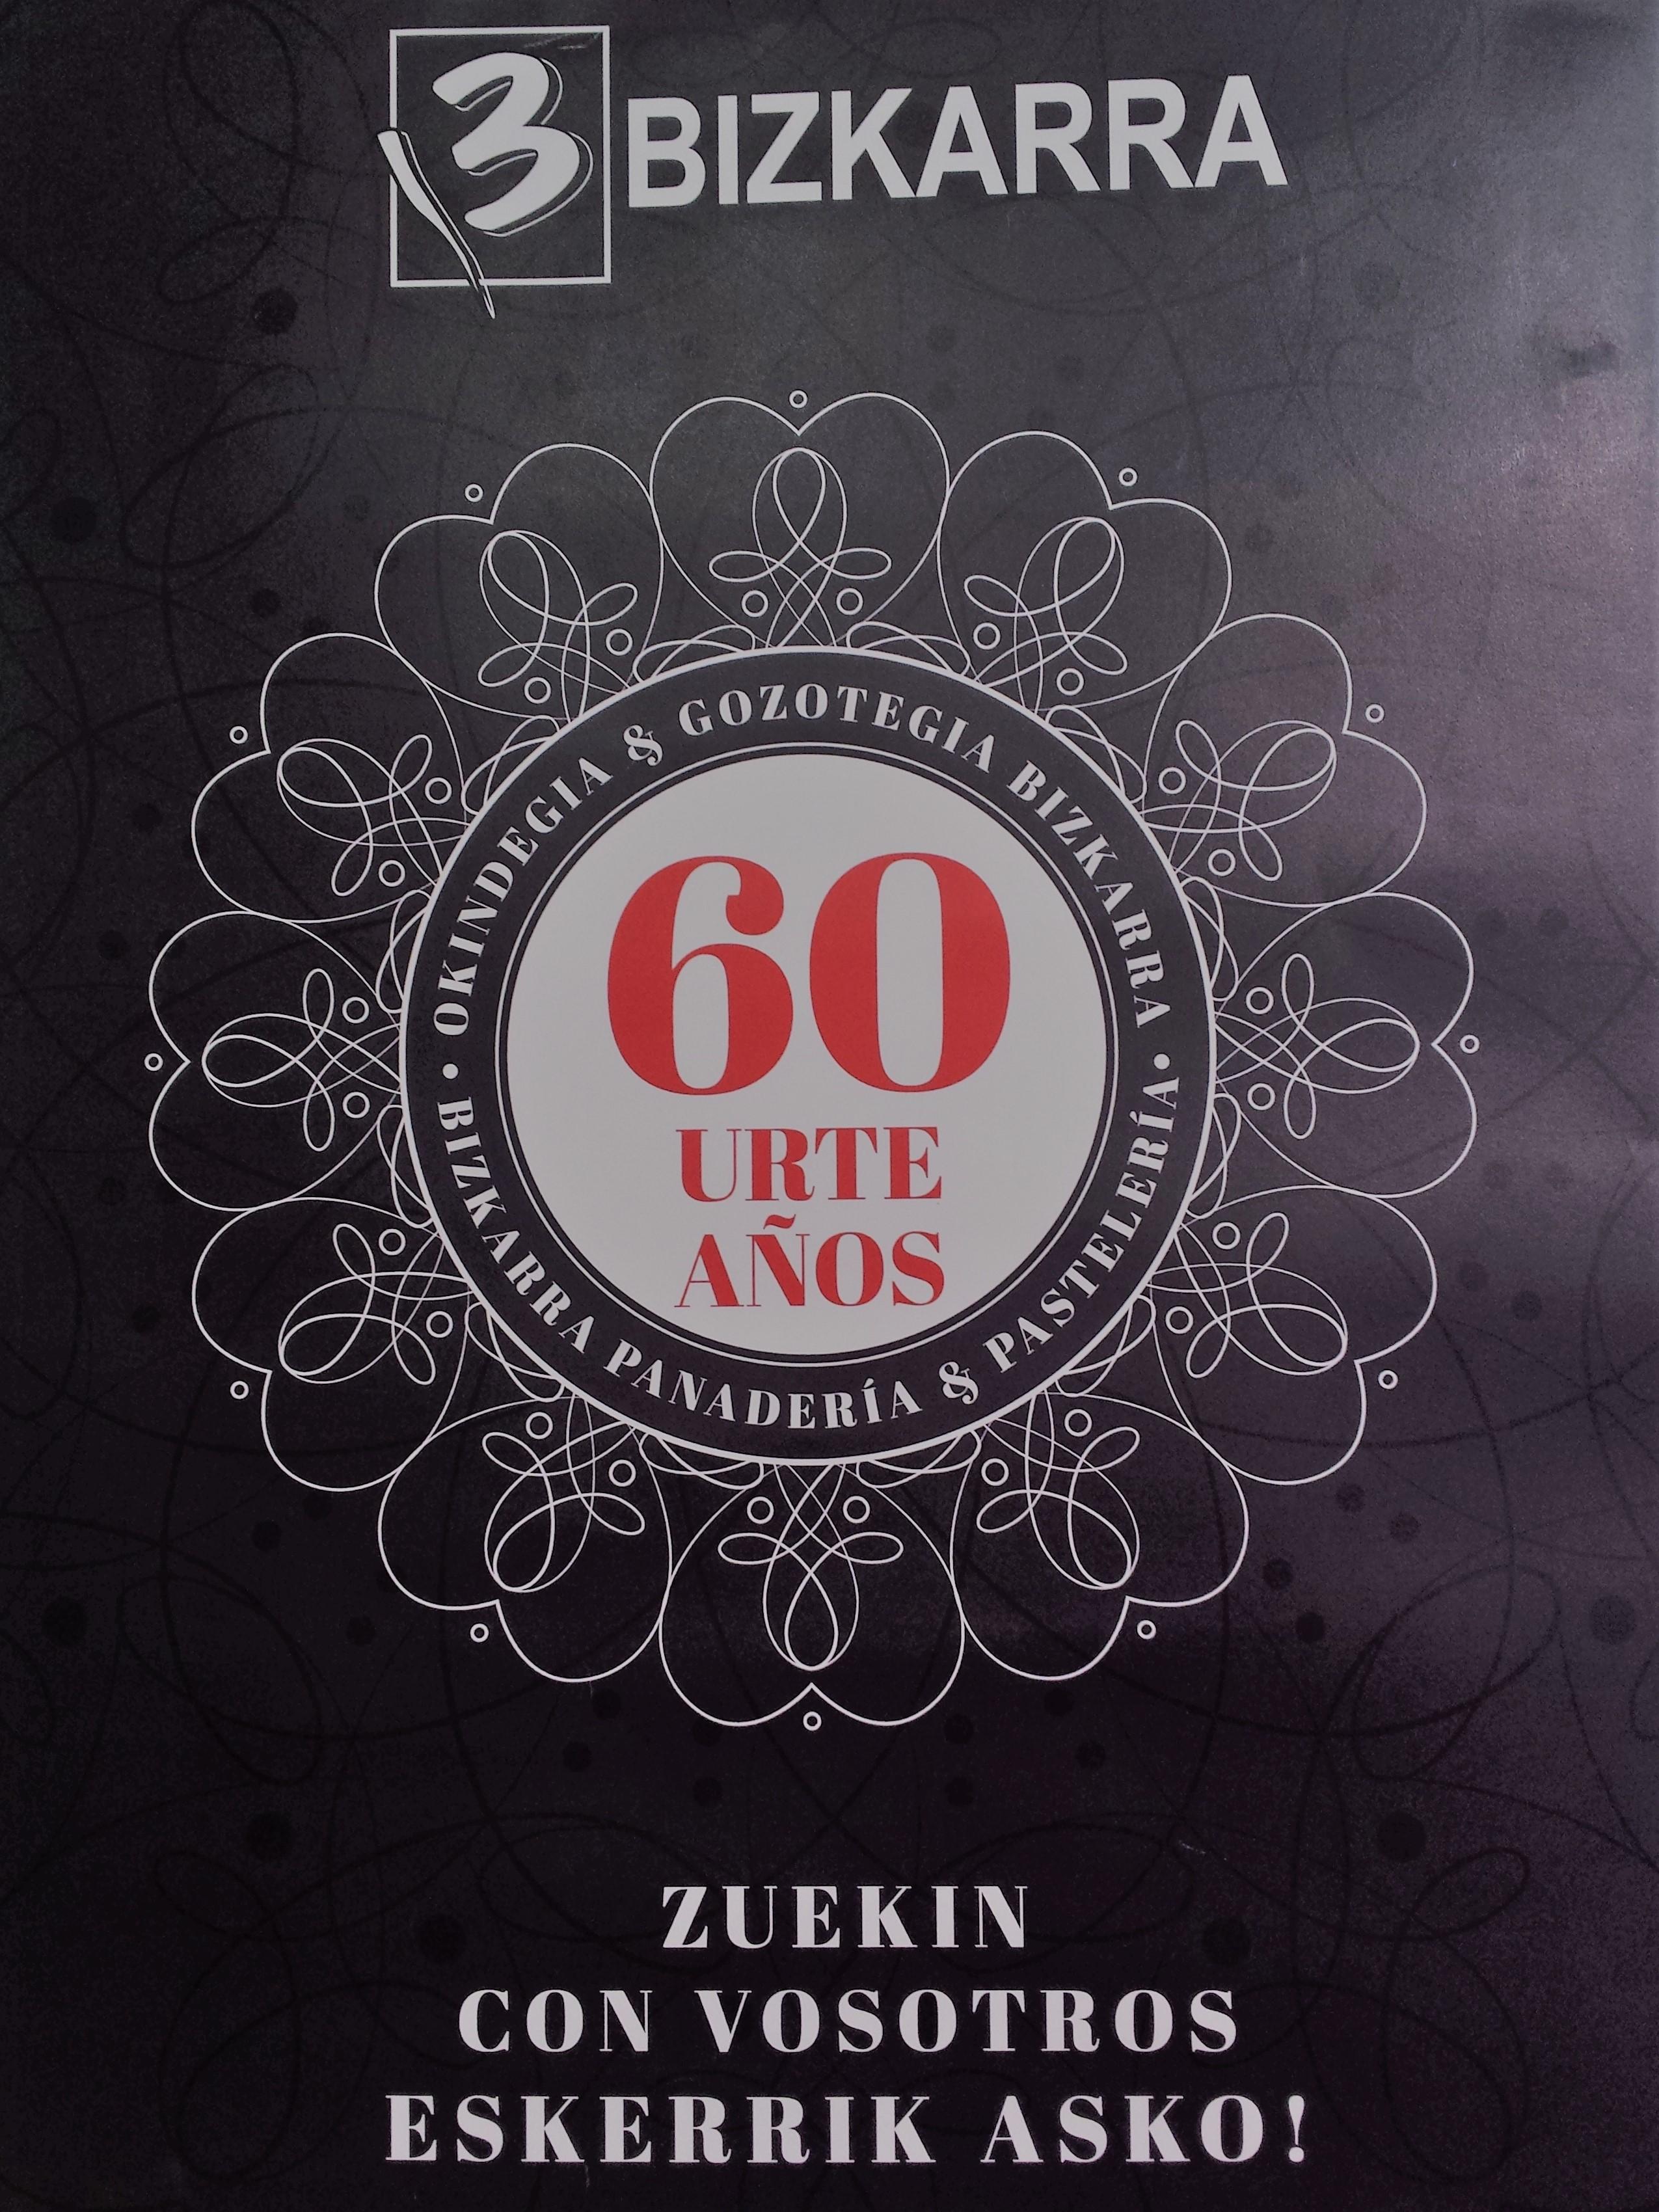 60 aniversario de Bizkarra 4